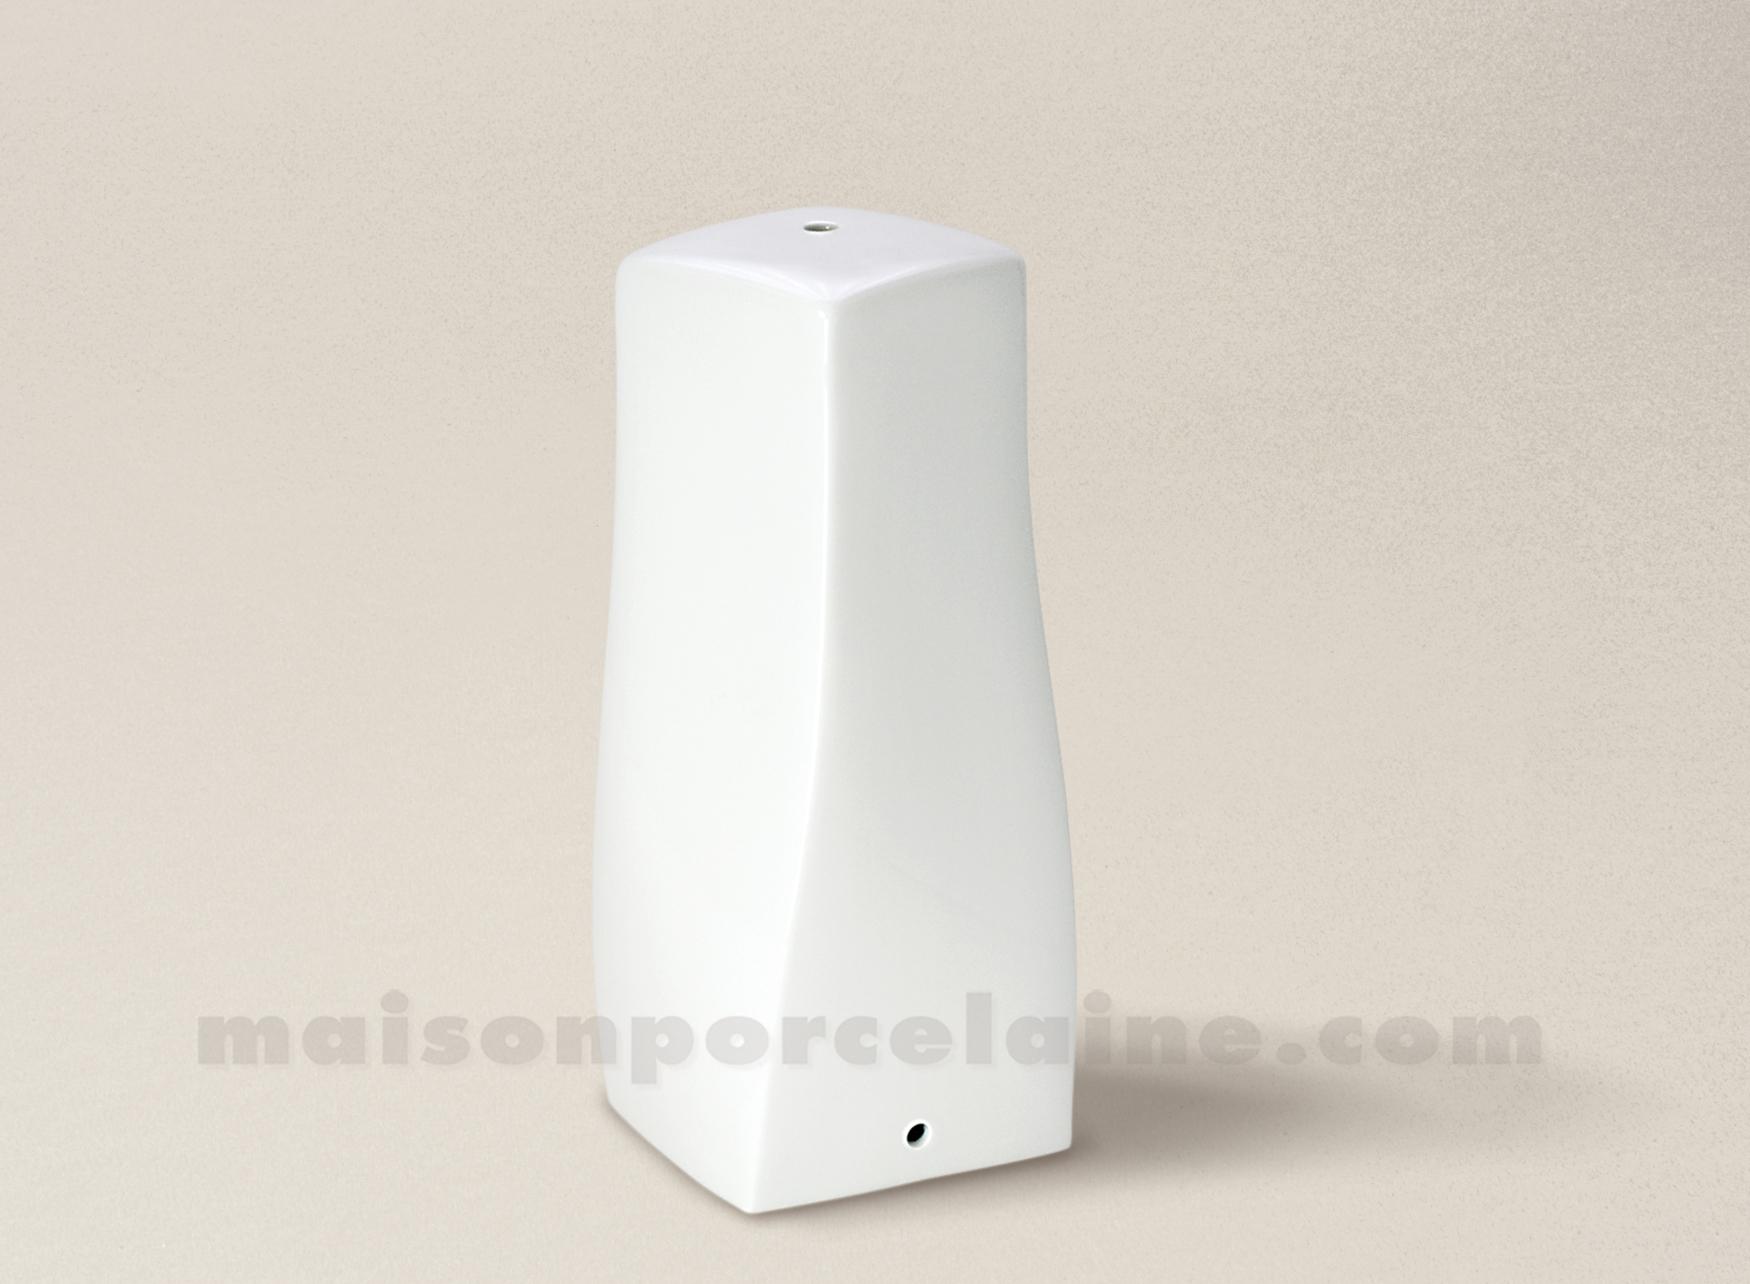 pied de lampe limoges porcelaine blanche vague 2eme 28. Black Bedroom Furniture Sets. Home Design Ideas